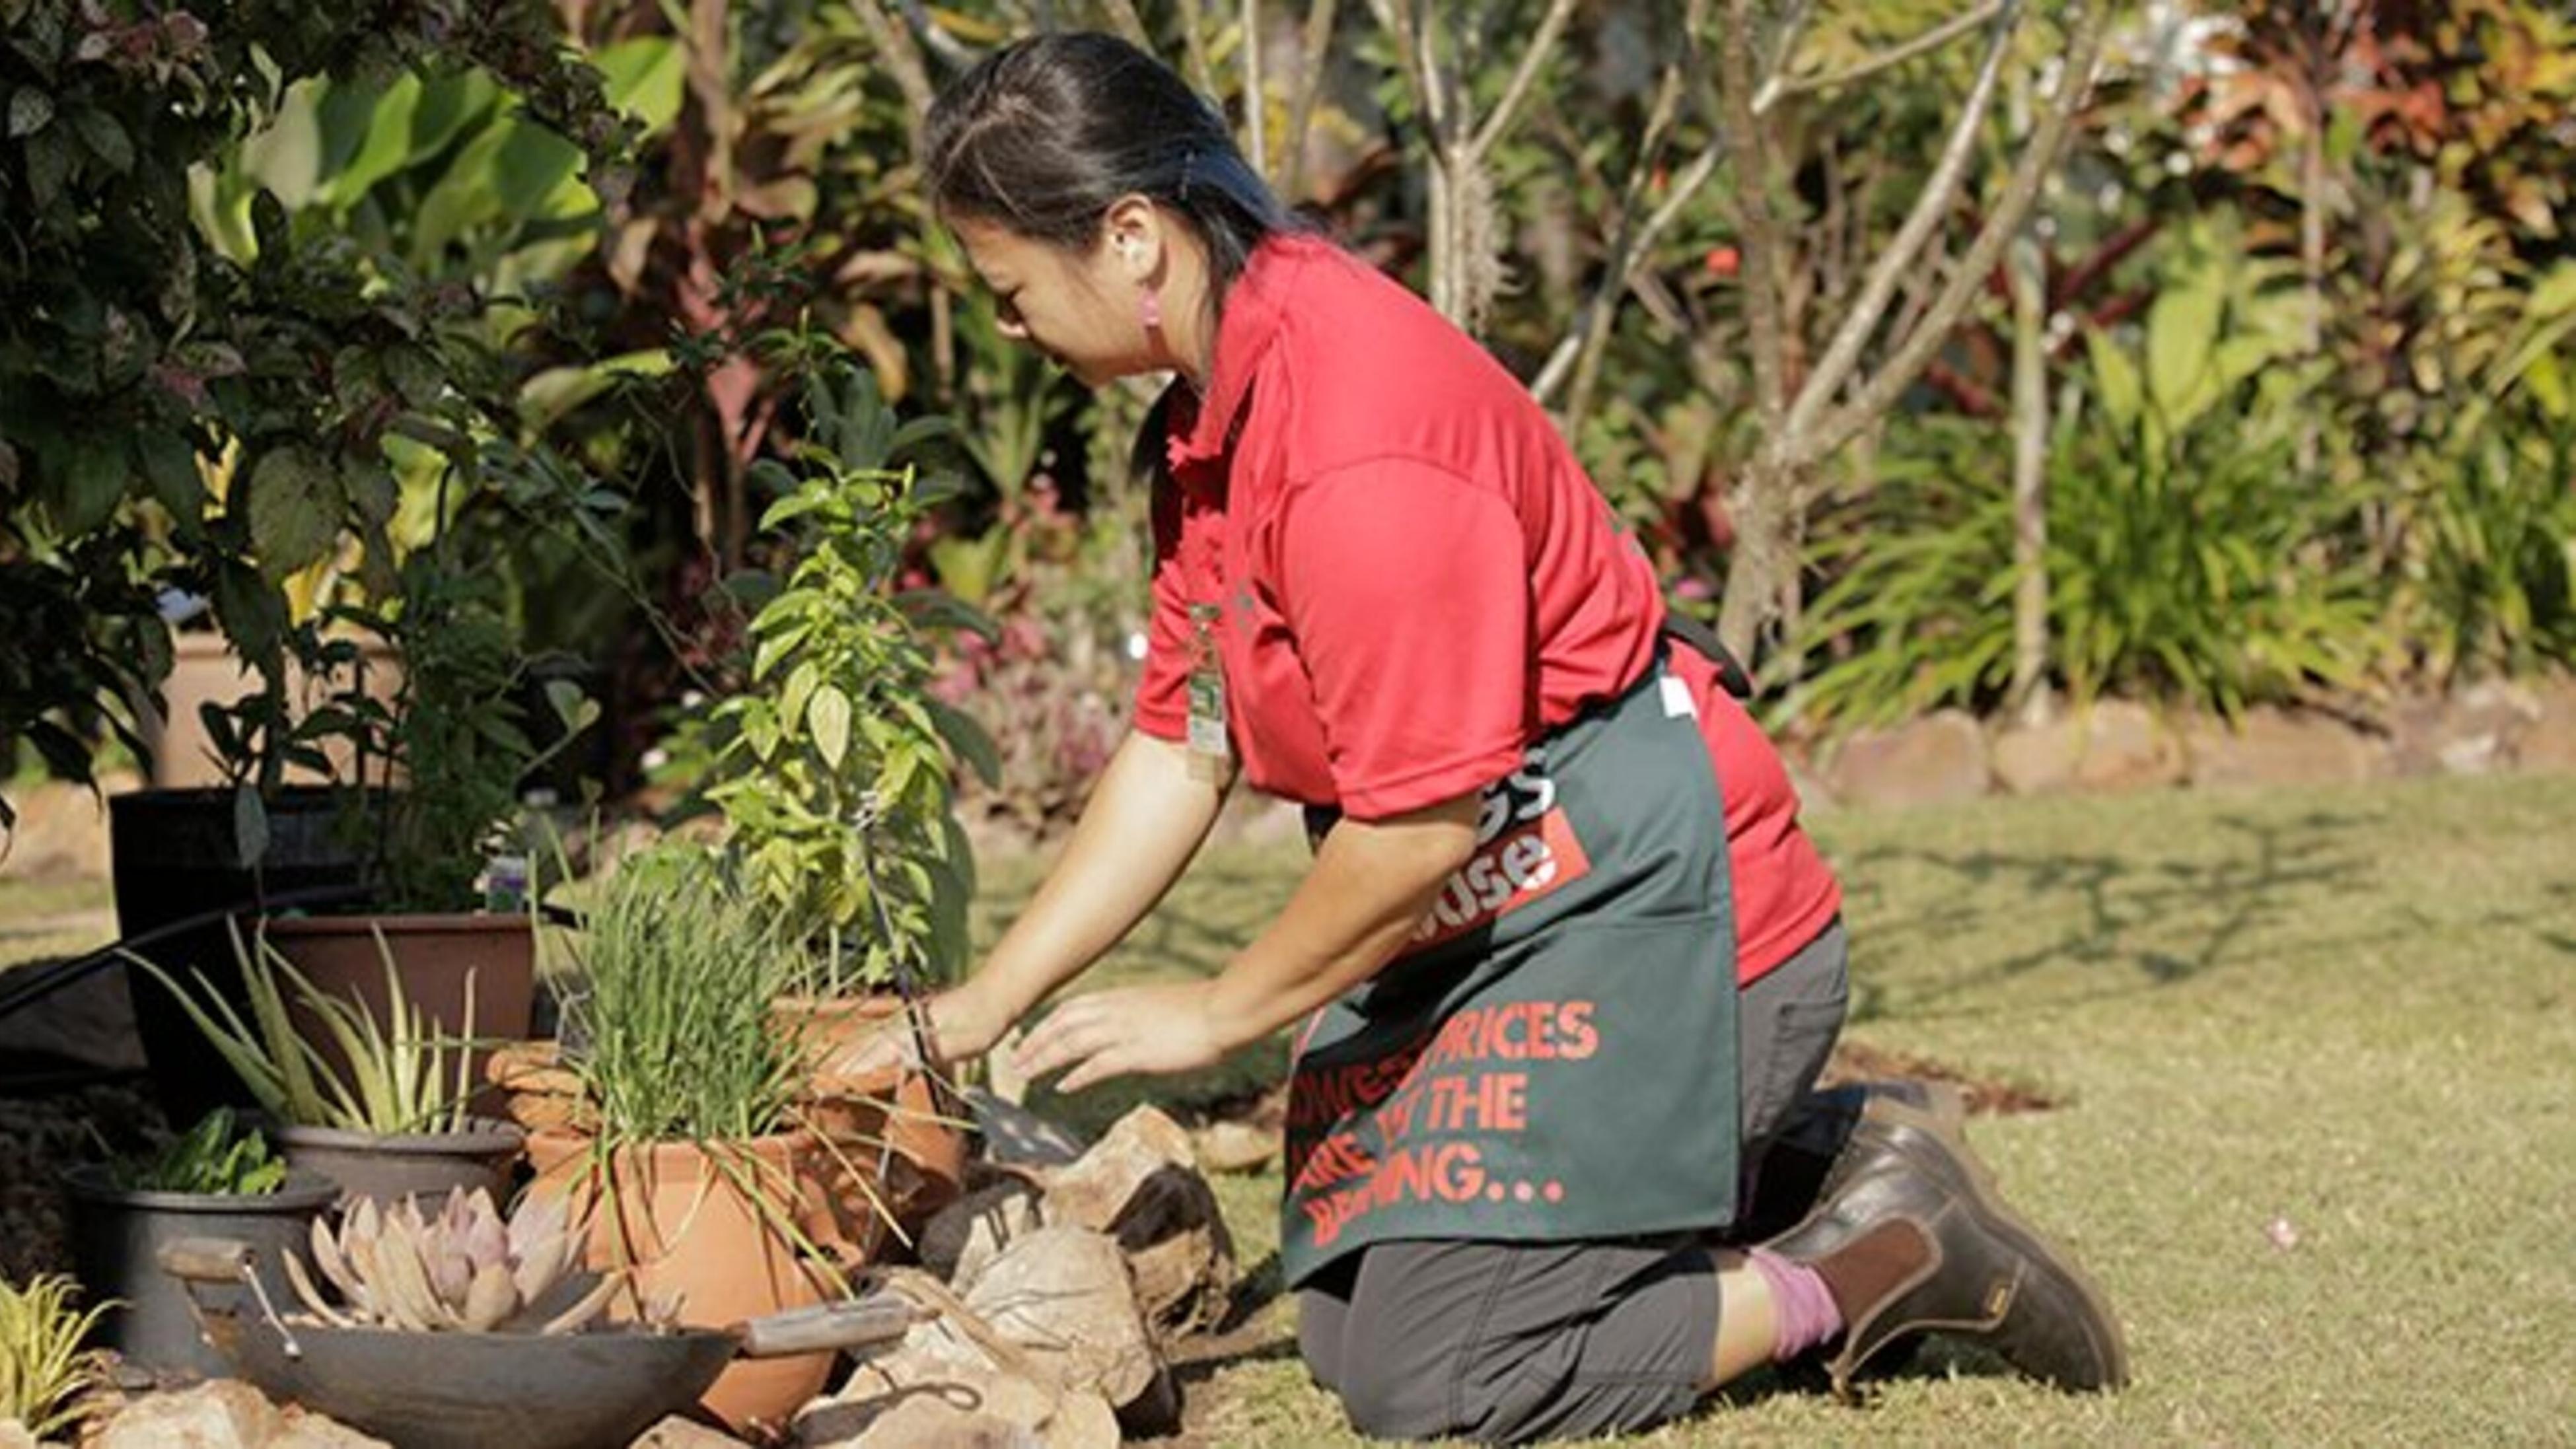 A Bunnings team member harvesting from the garden